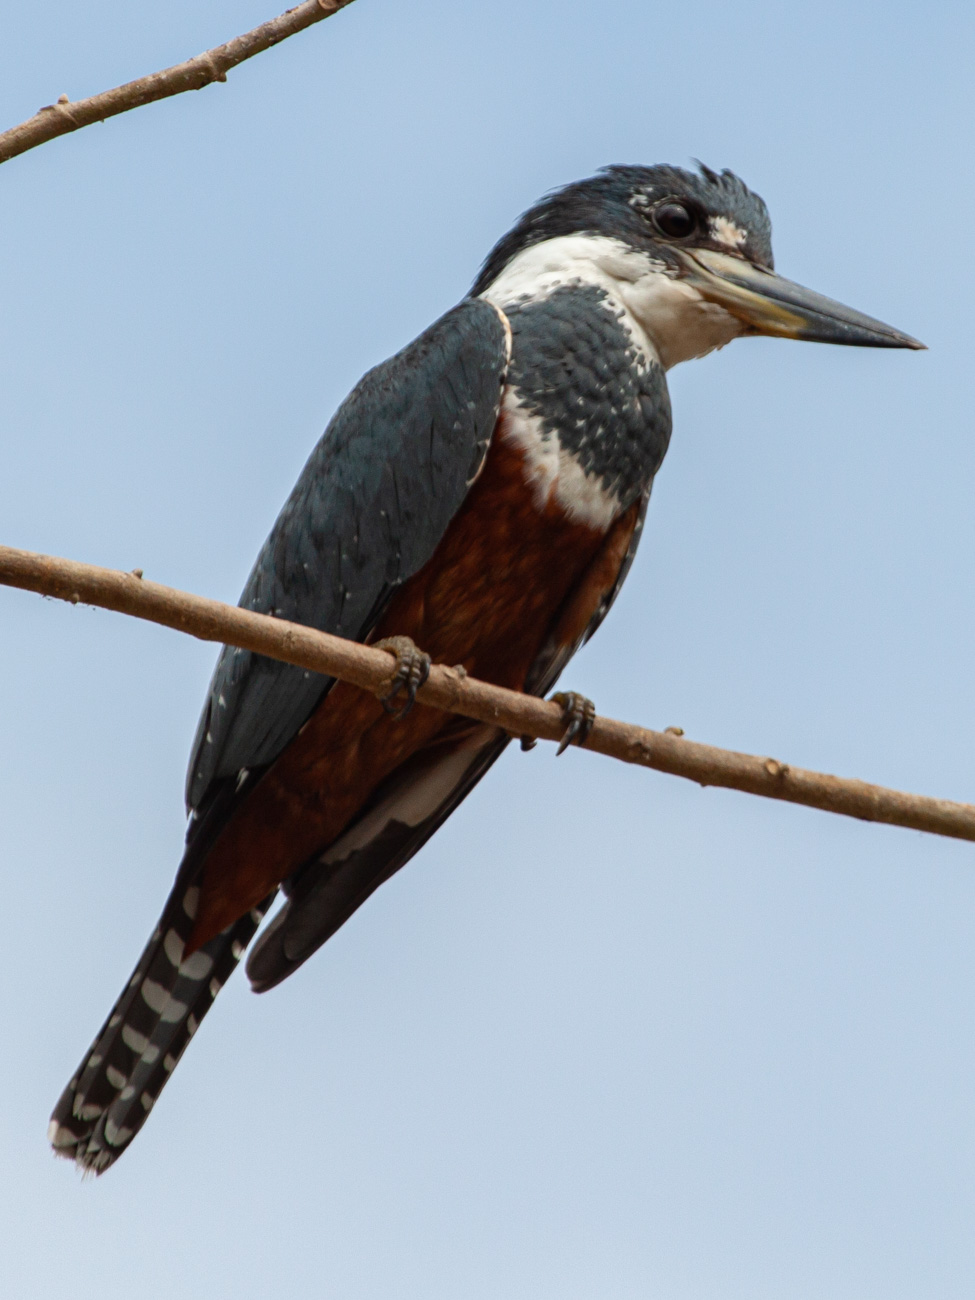 Ringed Kingfisher - Manuel Antonio National Park